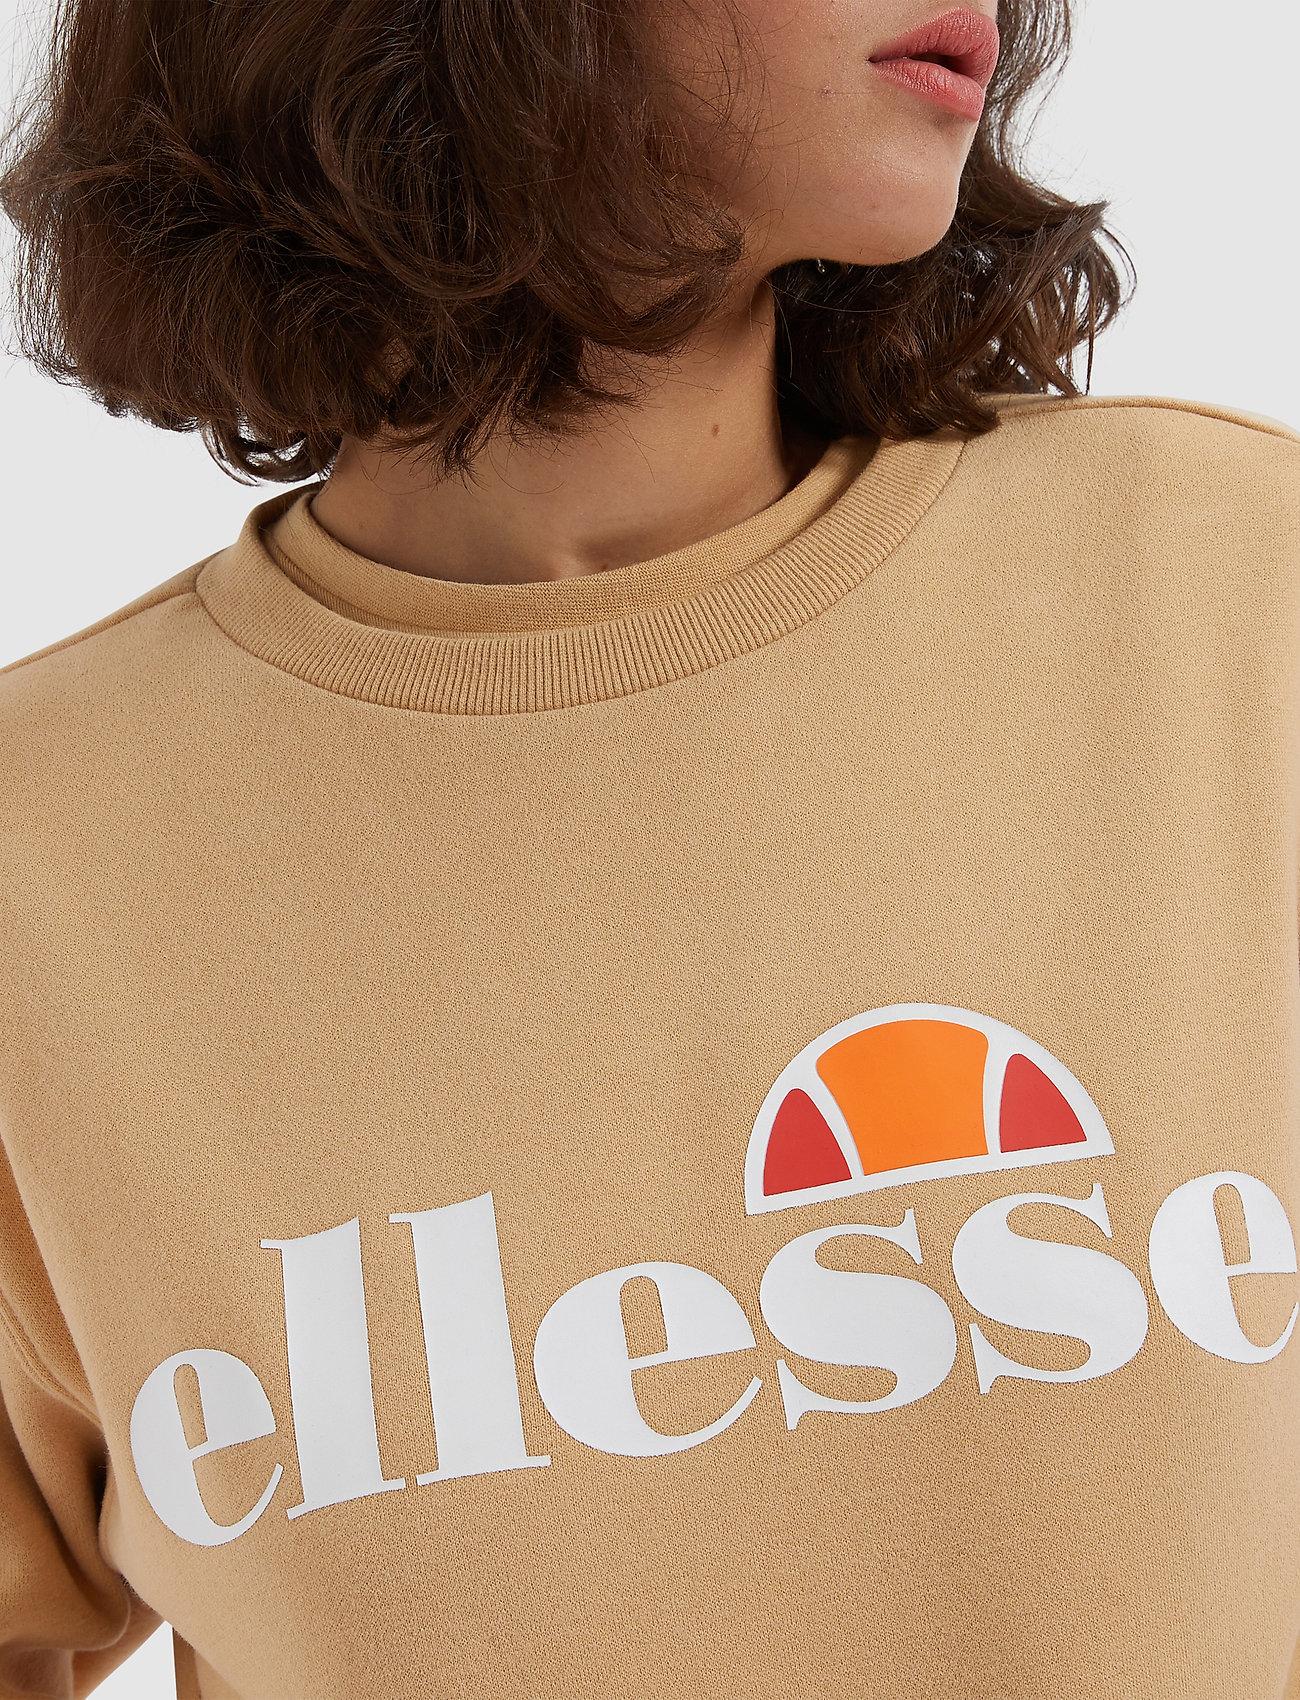 Ellesse EL AGATA SWEATSHIRT - Swetry BROWN - Kobiety Odzież.